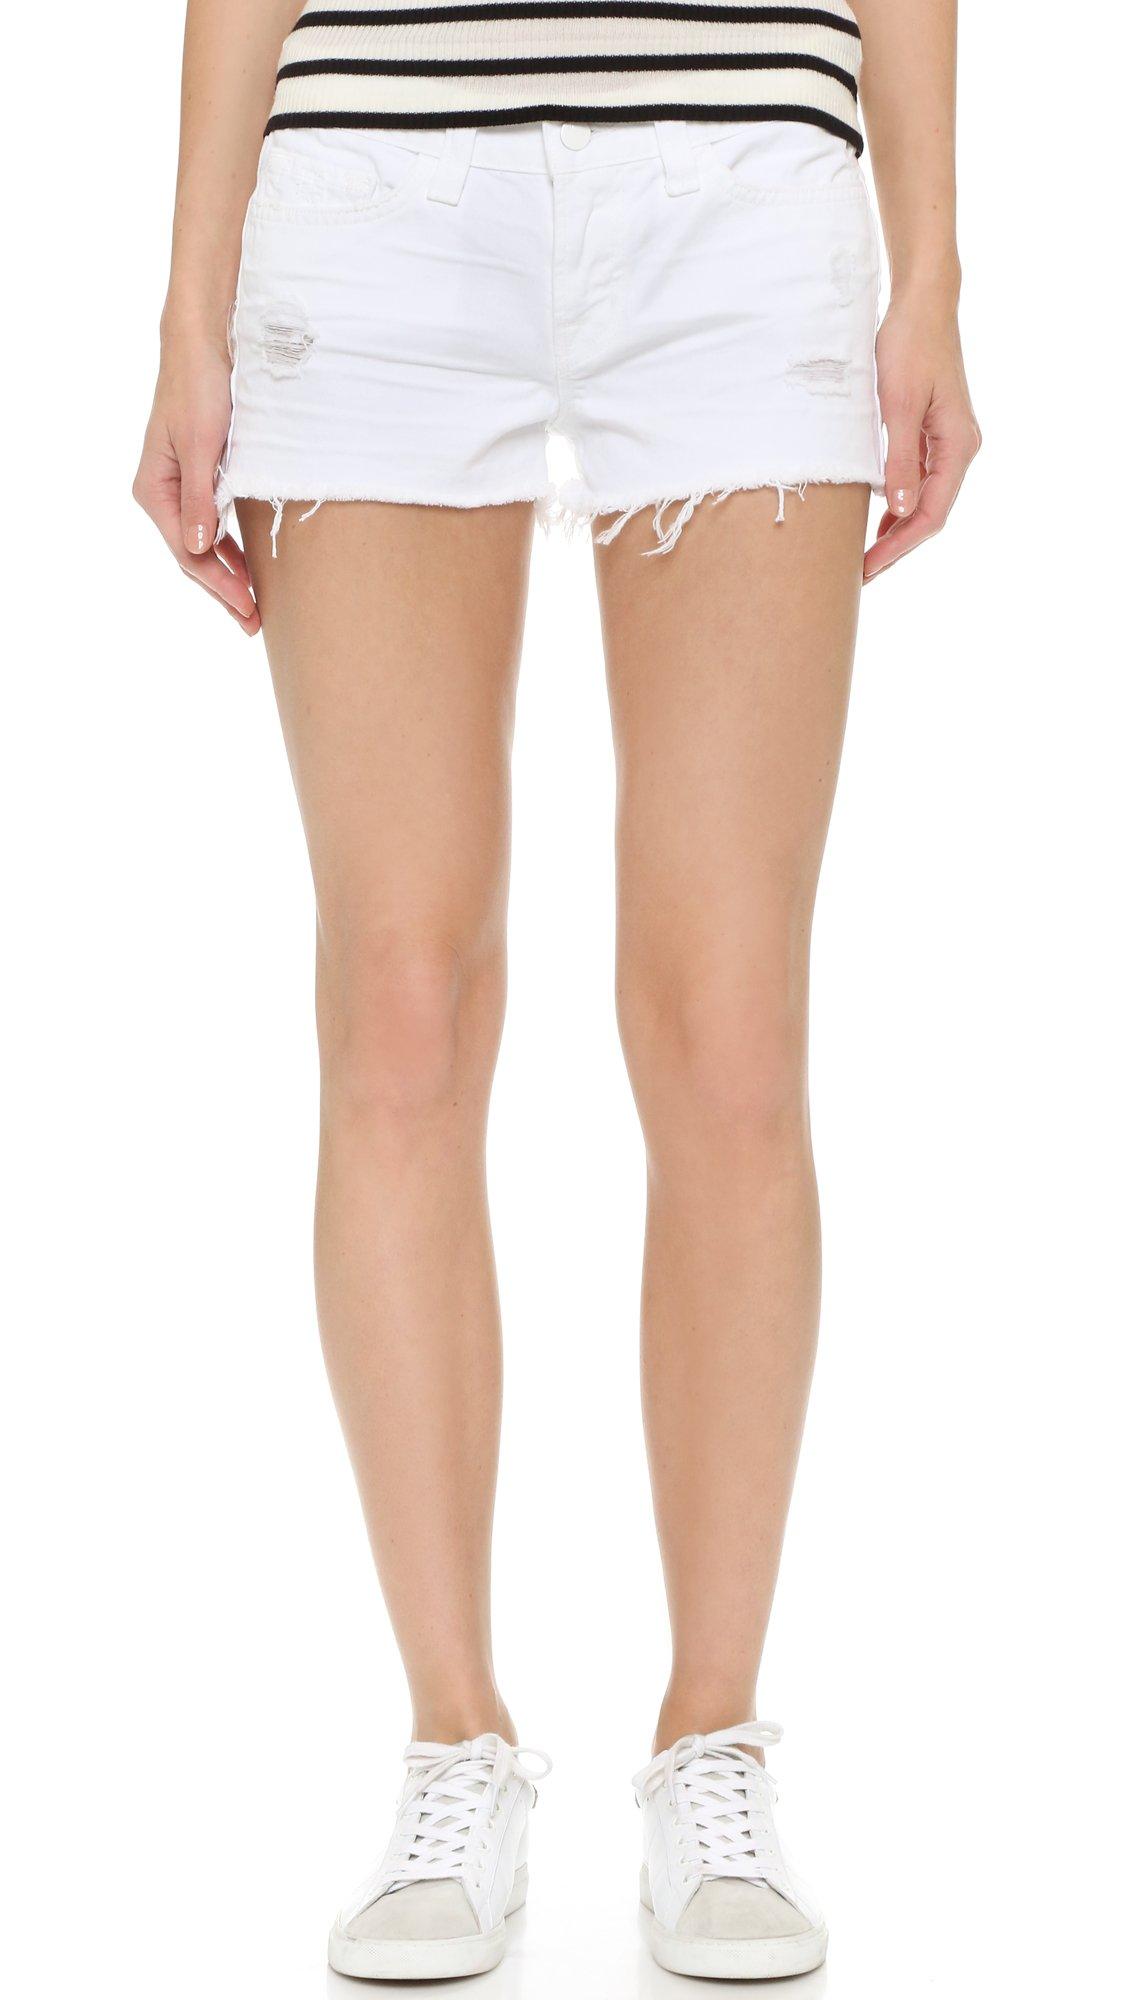 J Brand Women's 1046 Cutoff Shorts, White Vixen, 25